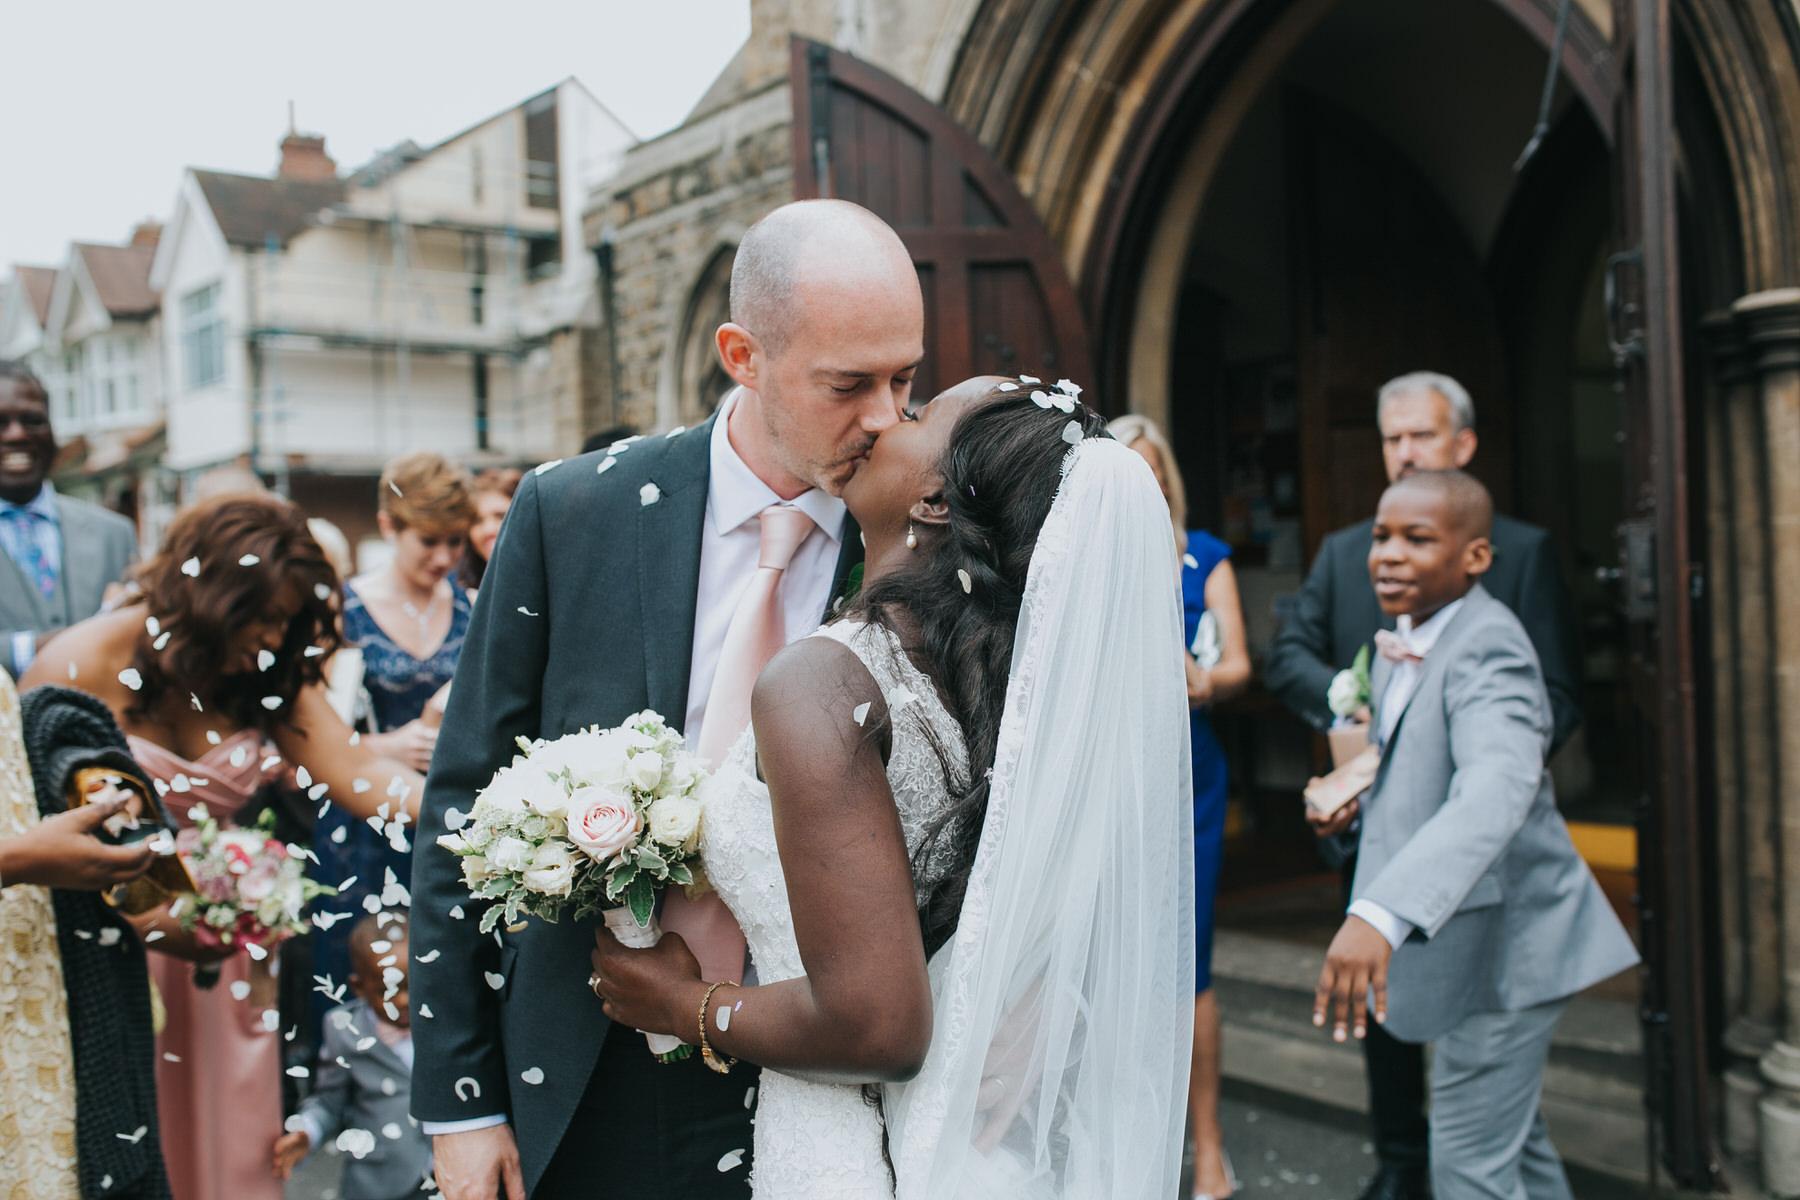 104 groom kissing bride during confetti outside church.jpg